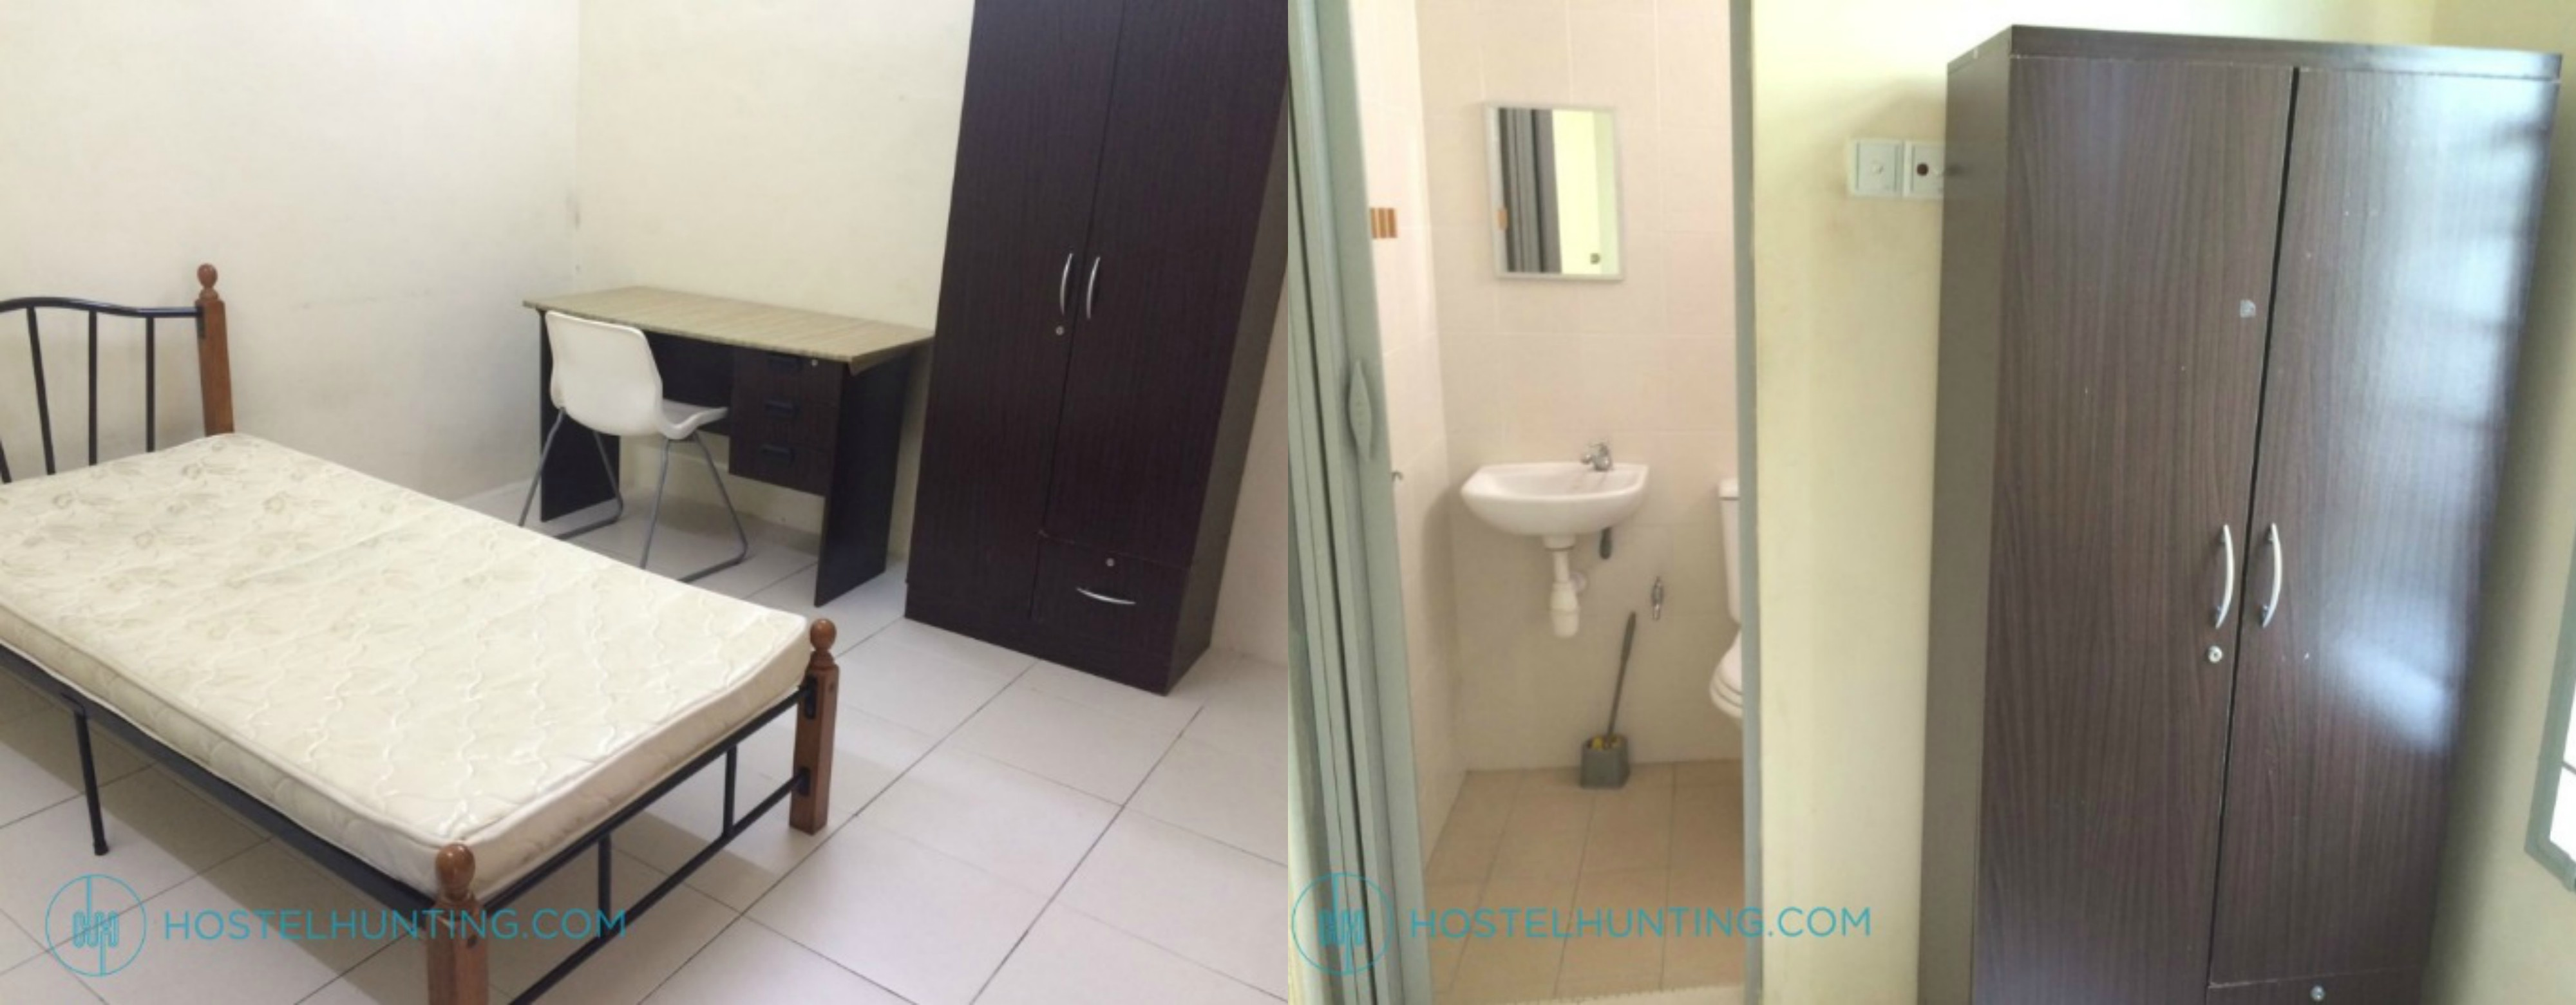 taman-bandar-barat kampar students accommodation hostel room rent